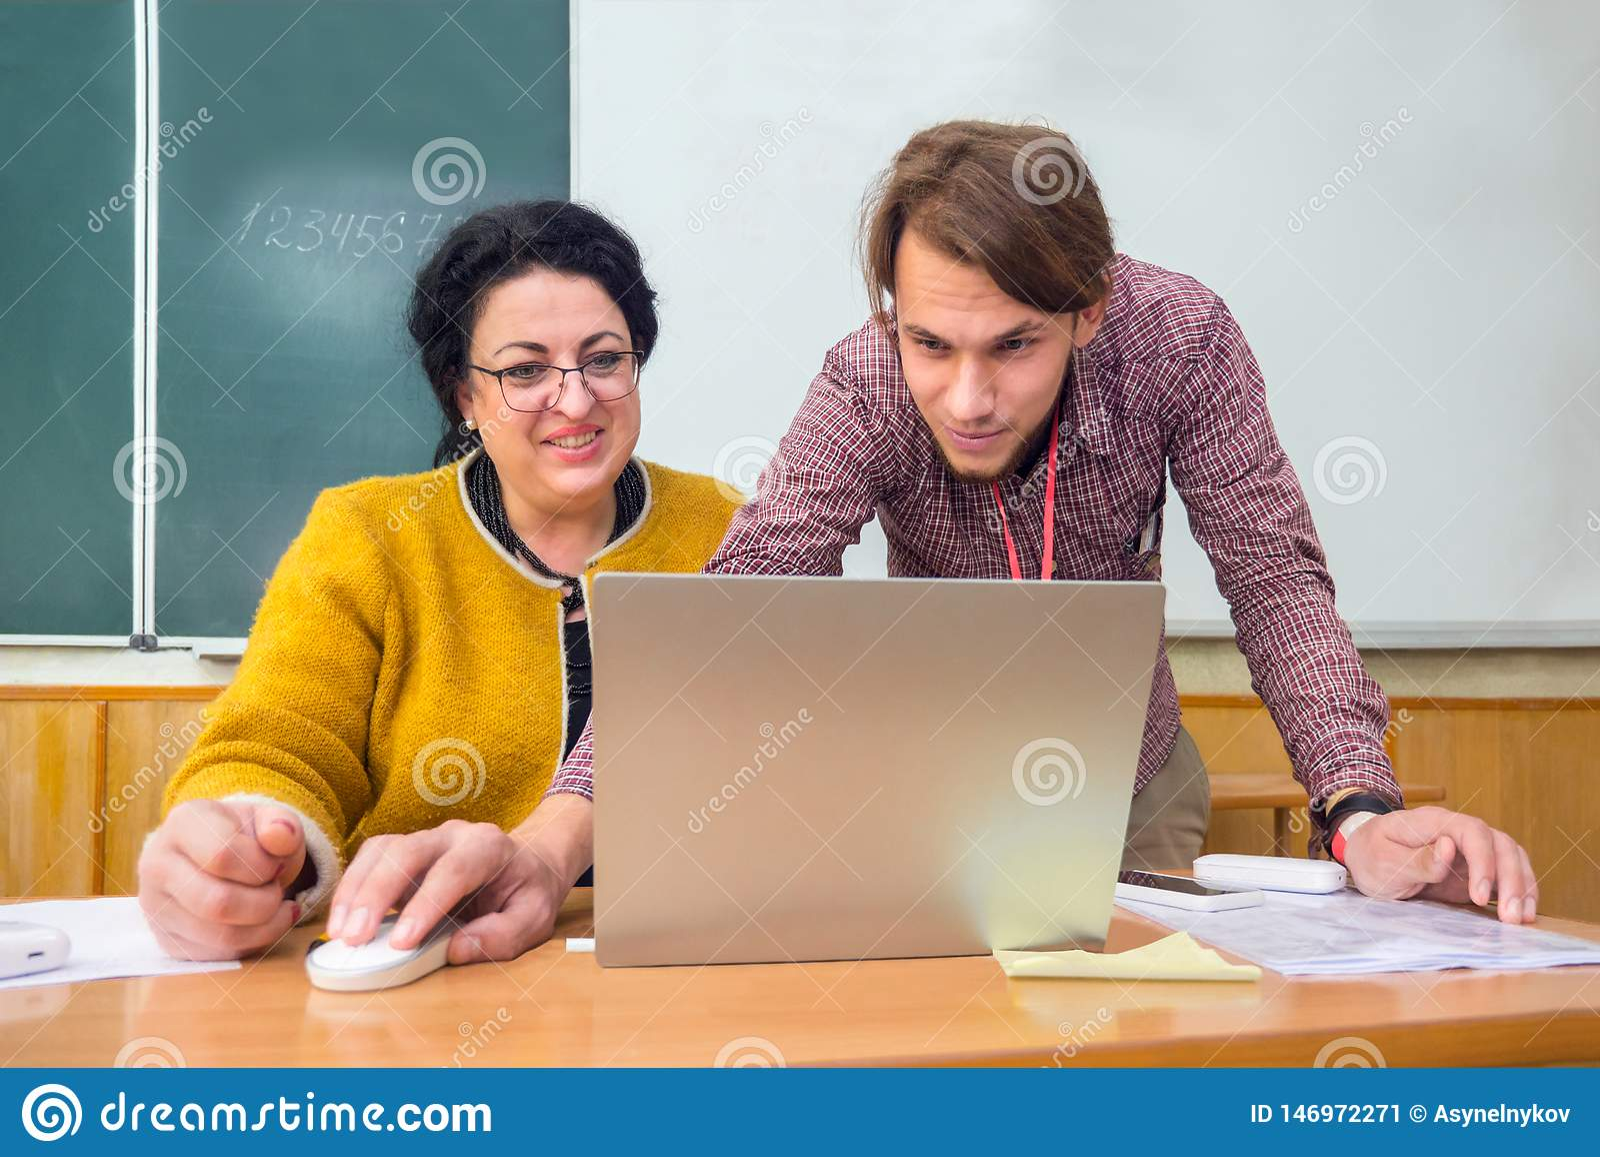 Young generation instruct teachers, elder people. Multi generation business forum. Education concept. New generation